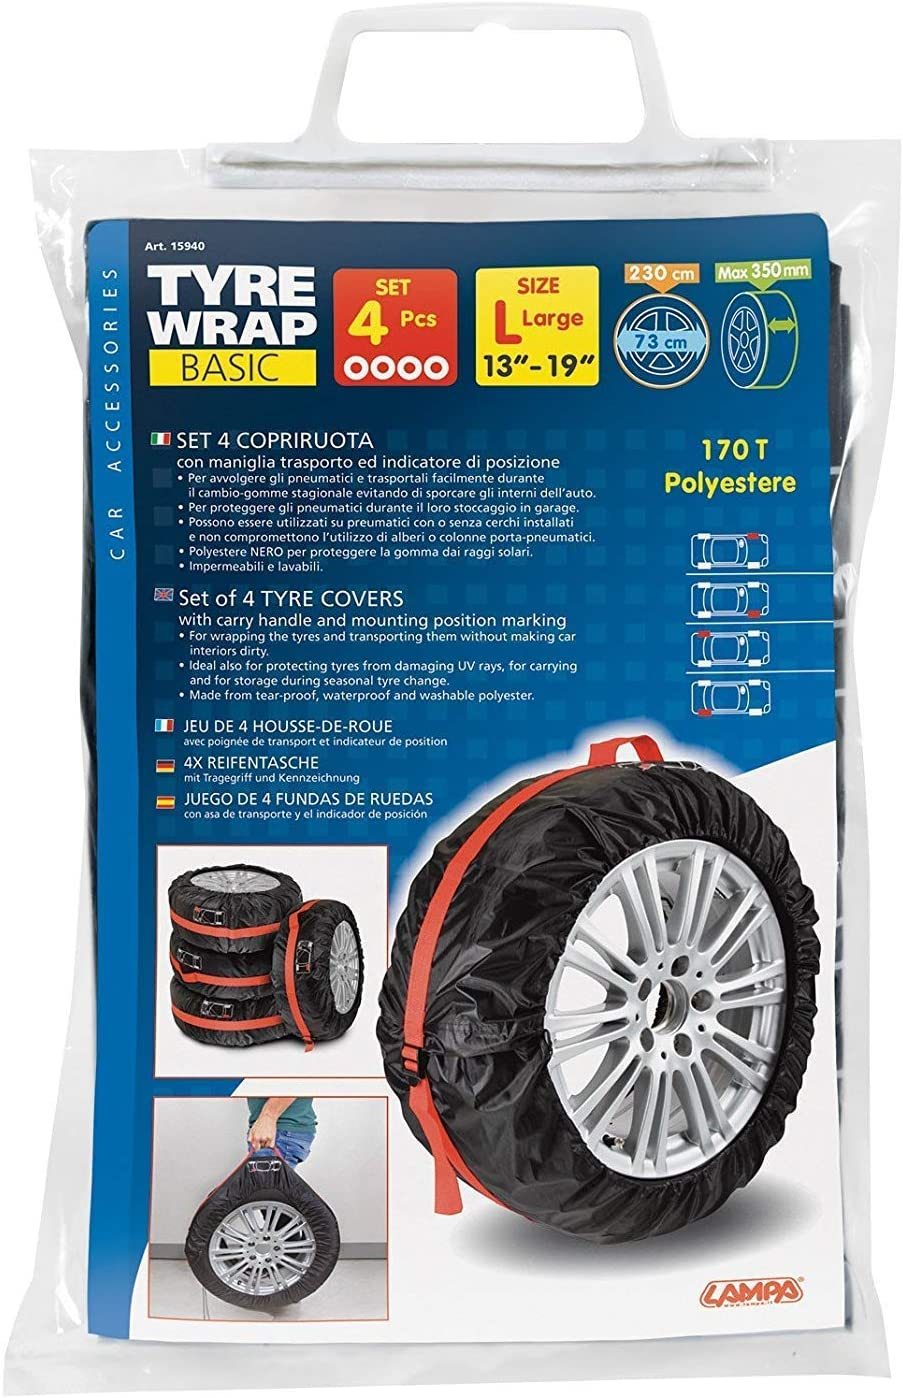 Poliestere Lampa 15940 Tyre-Wrap Basic Set 4 Copriruota